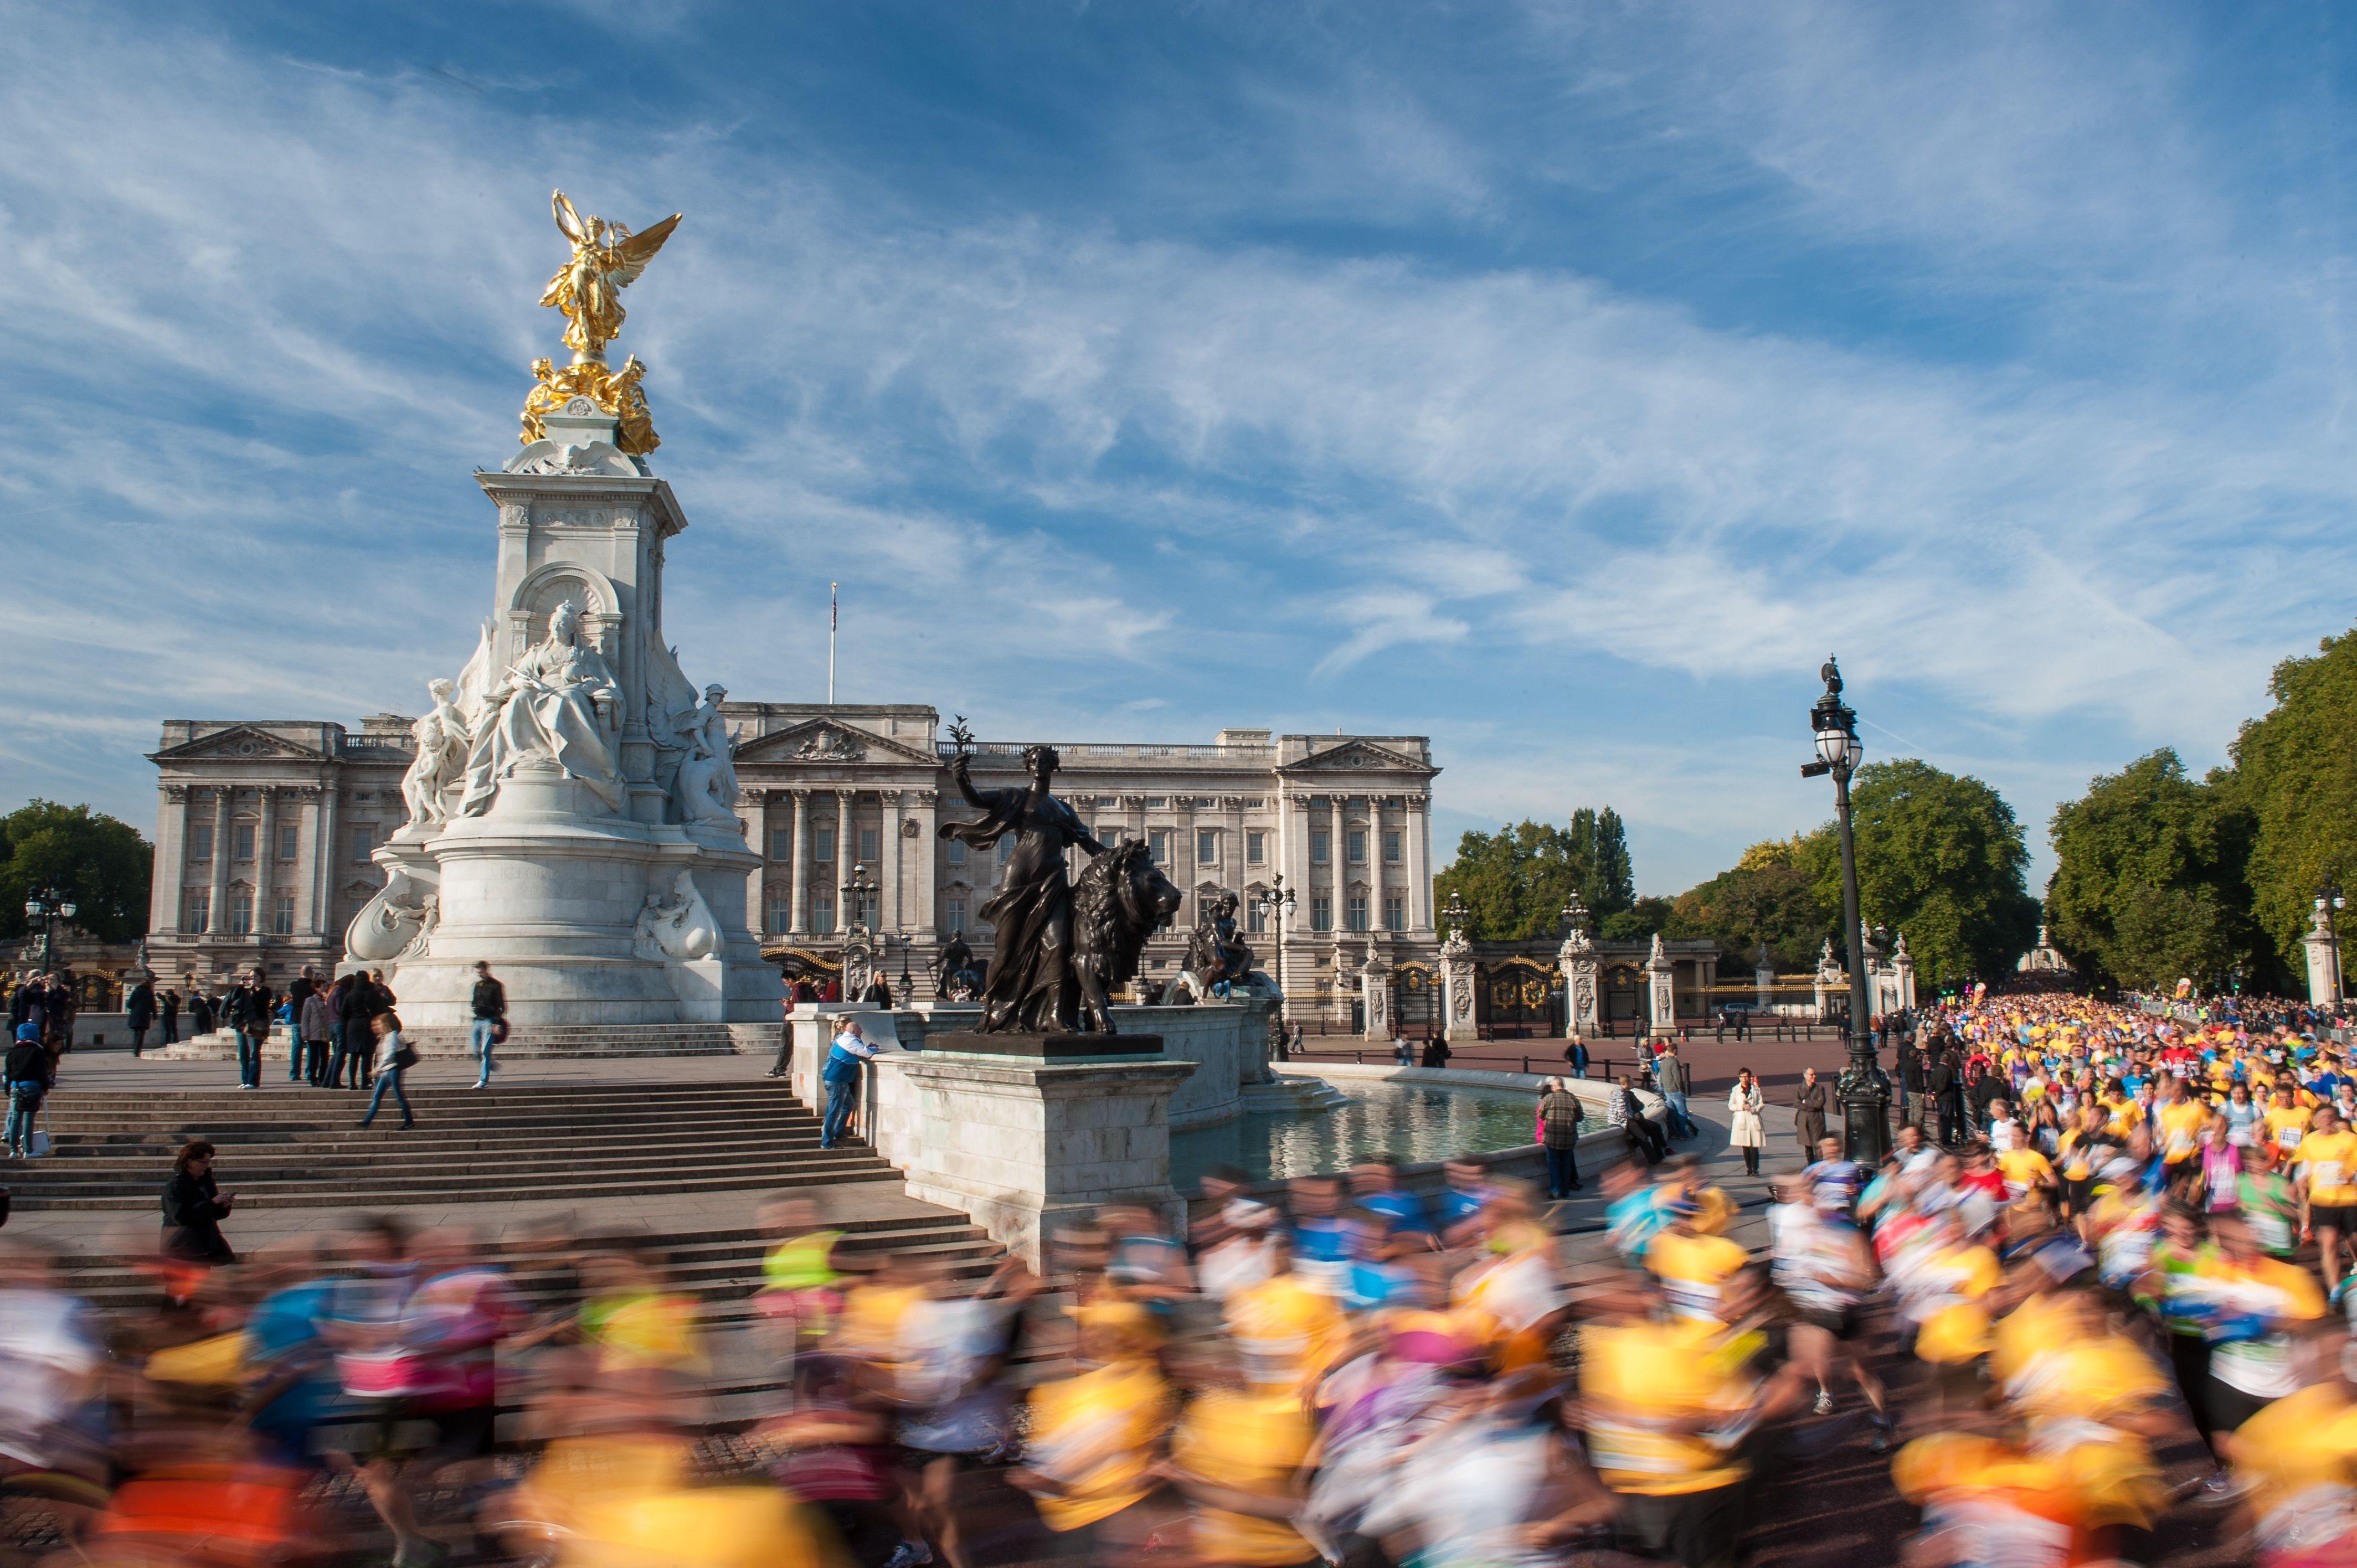 Half marathon training plan with images royal park